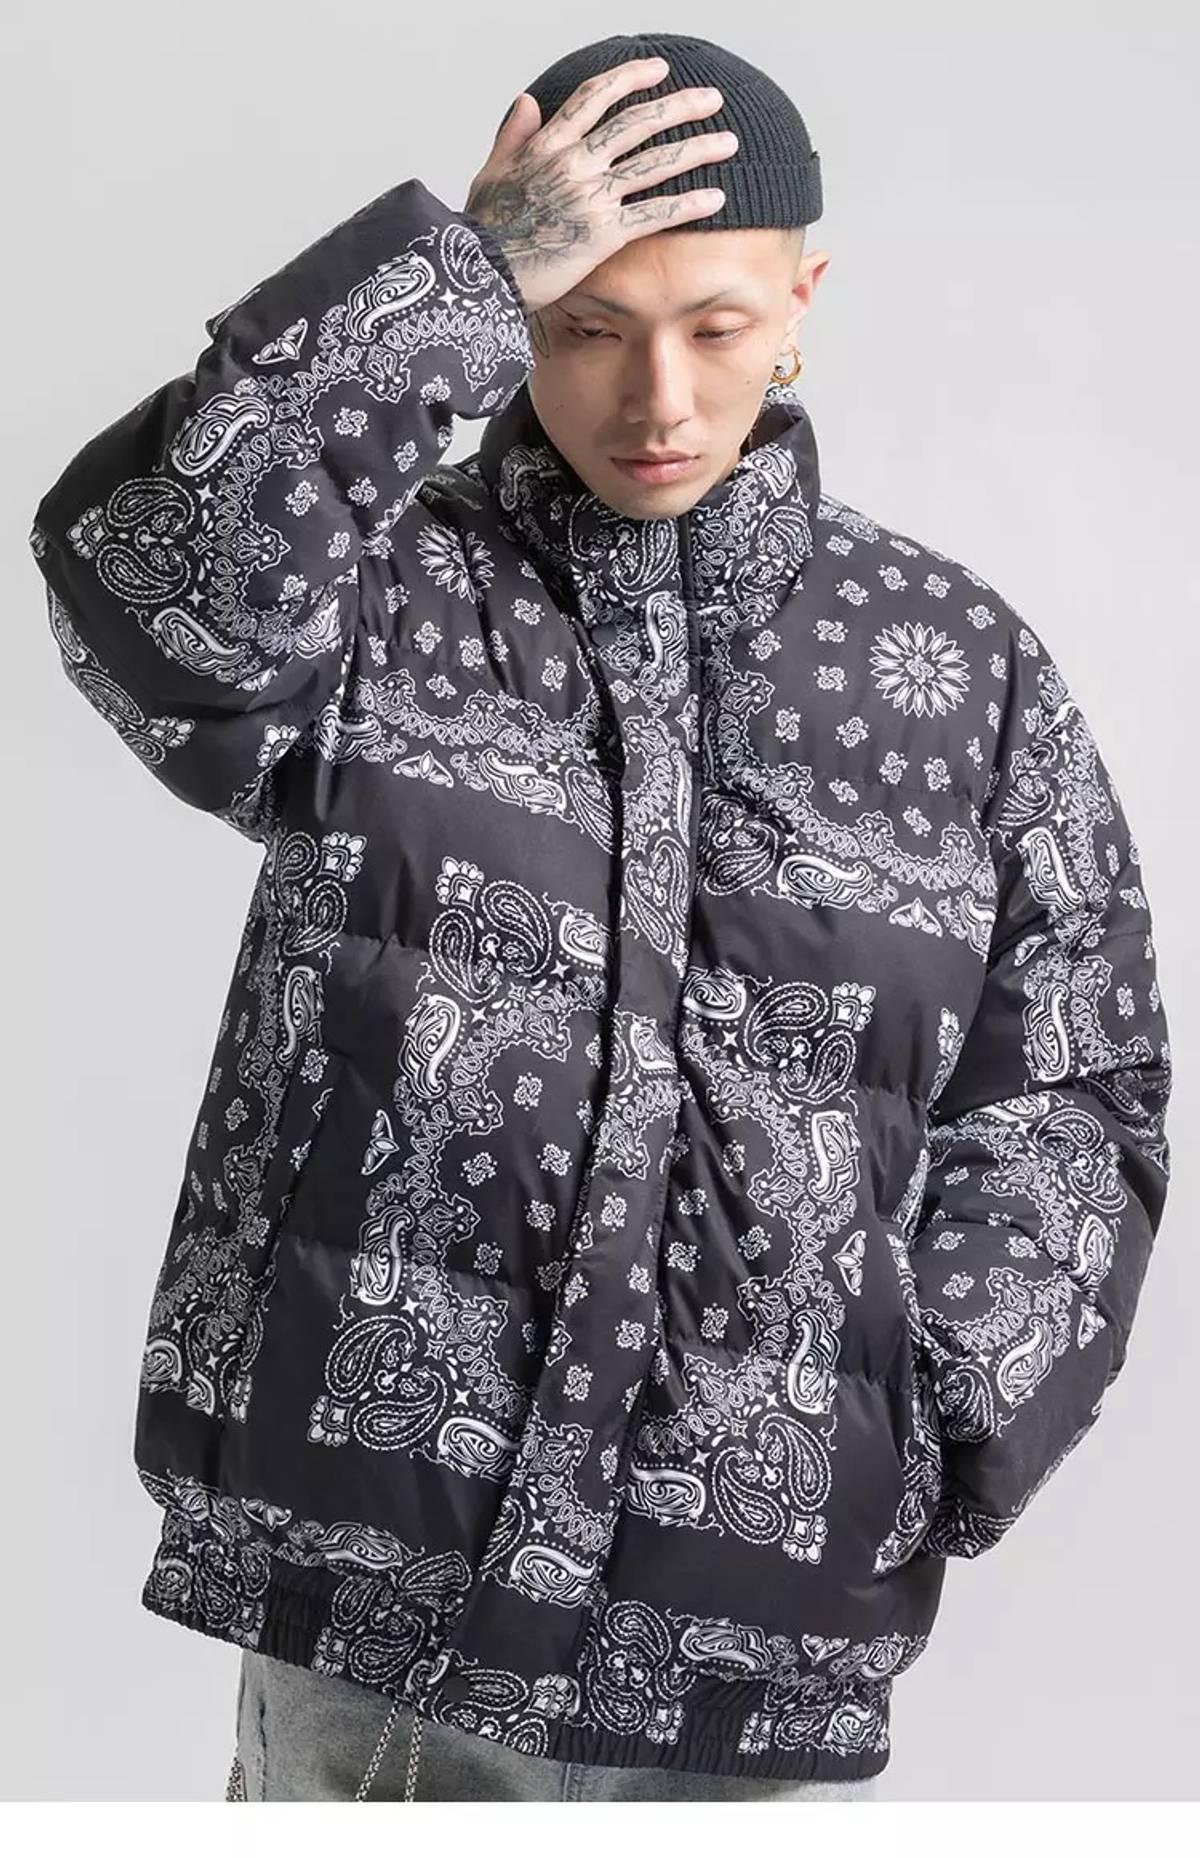 Japanese Brand Paisley Bandana Print Puffer Jacket Grailed